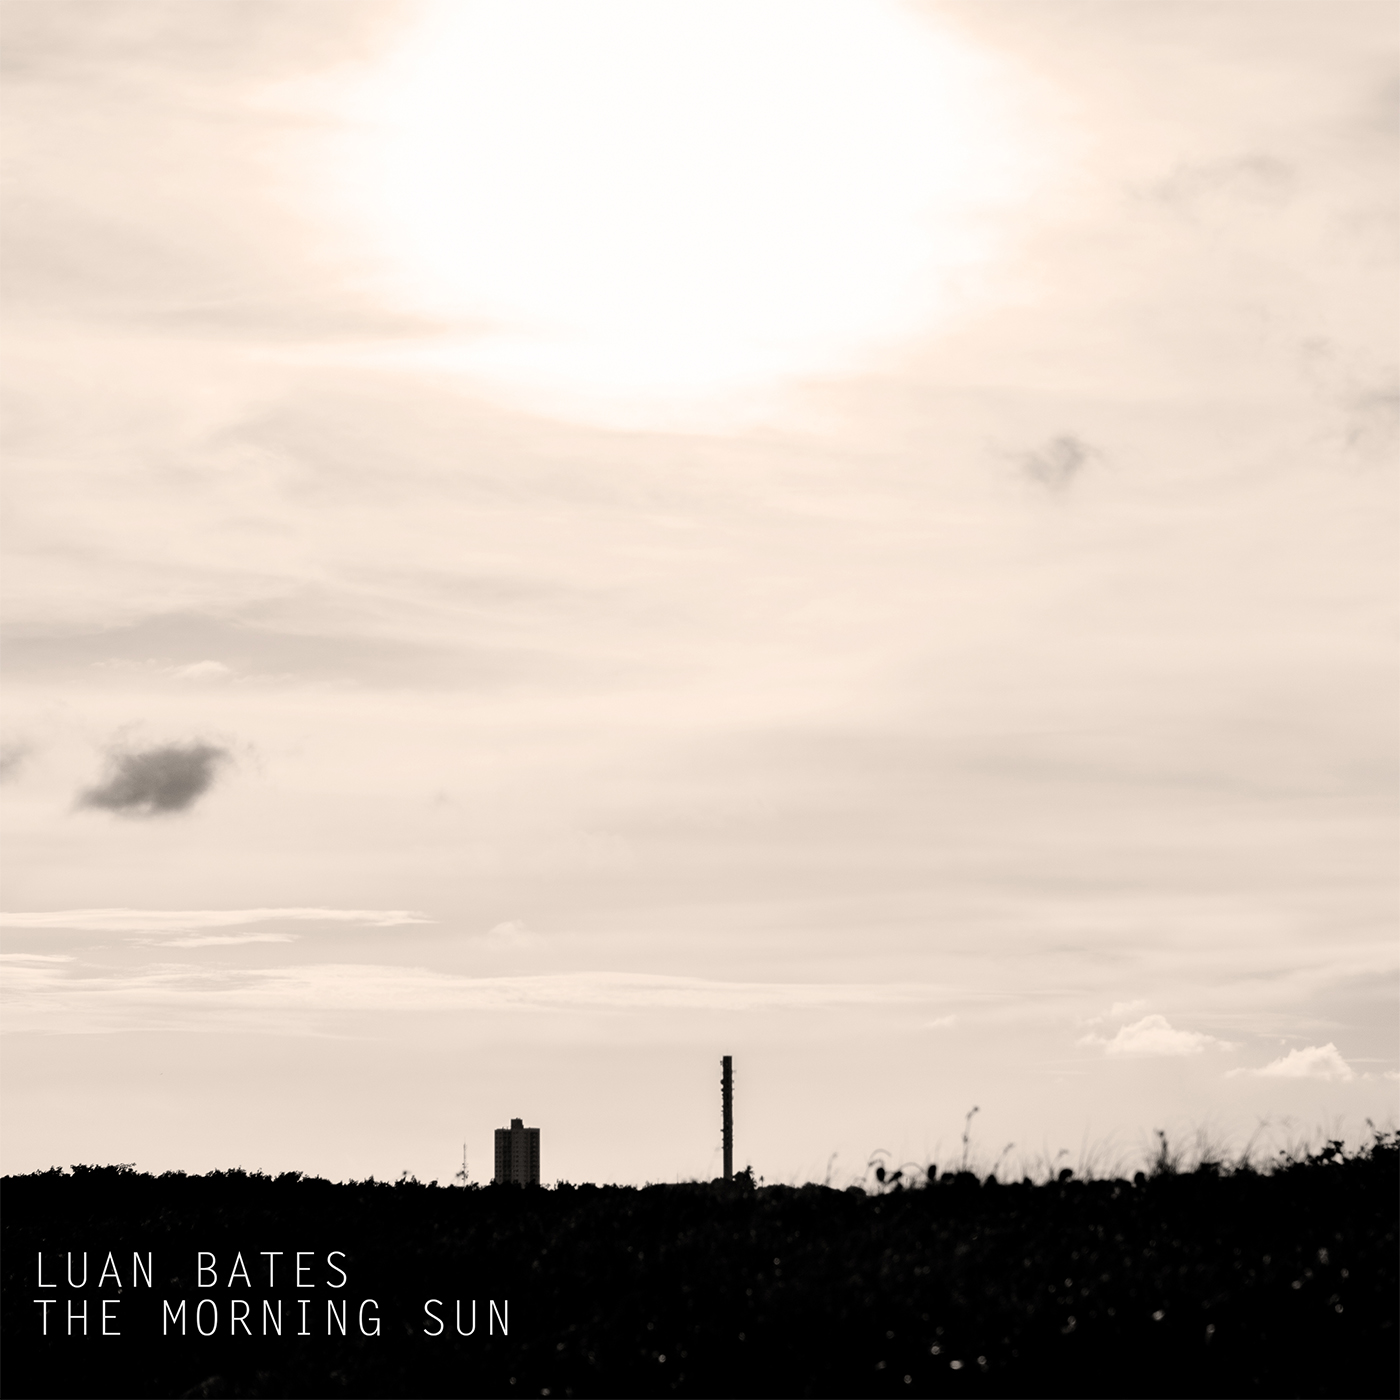 2018 – Luan Bates – The Morning Sun [Álbum]